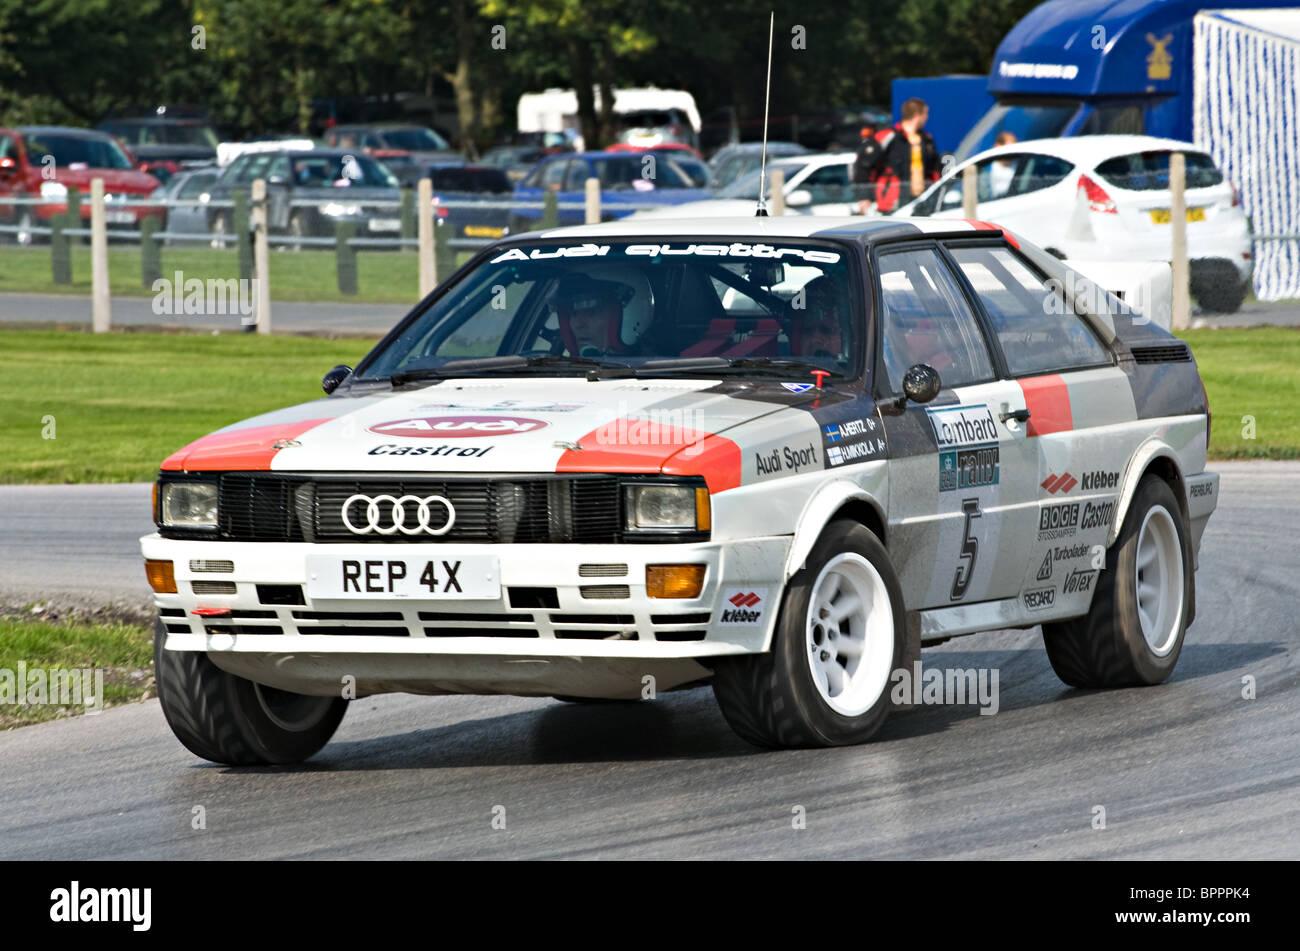 Audi Quattro Group B on alfa romeo group b, audi rally group b, audi 90 group b, ford group b, mitsubishi starion group b, audi s2 group b, audi wrc, audi cars, audi sport, opel manta group b, ferrari group b, subaru impreza group b, bmw group b, peugeot group b, renault group b, porsche group b, lancia group b,